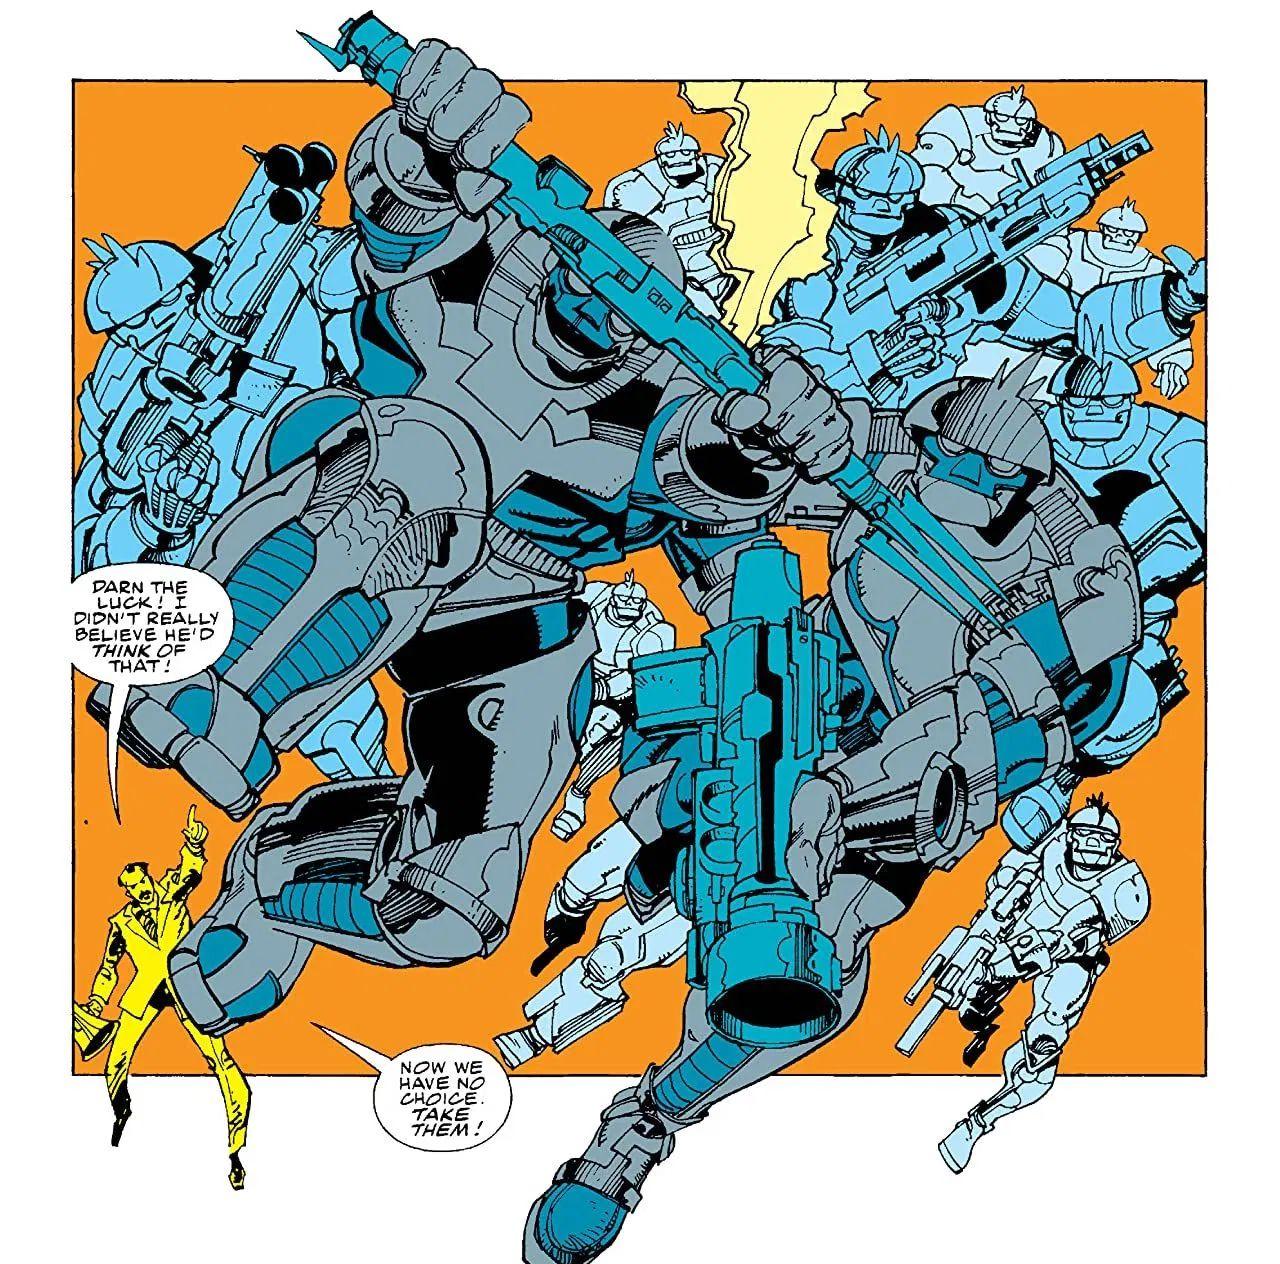 loki serie marvel mobius m. mobius marvel comics